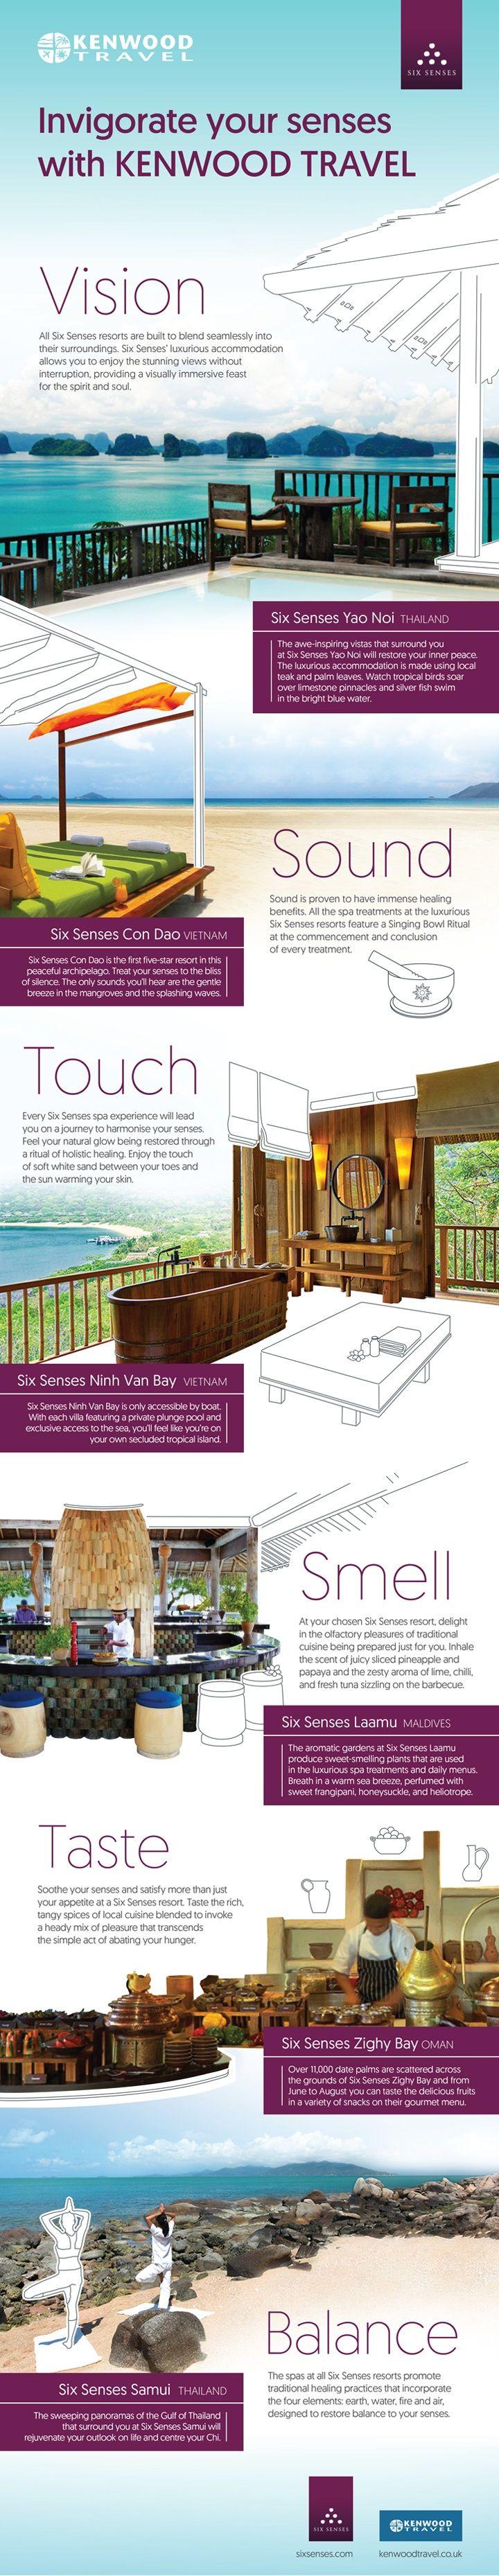 Invigorate your Senses with Kenwood Travel